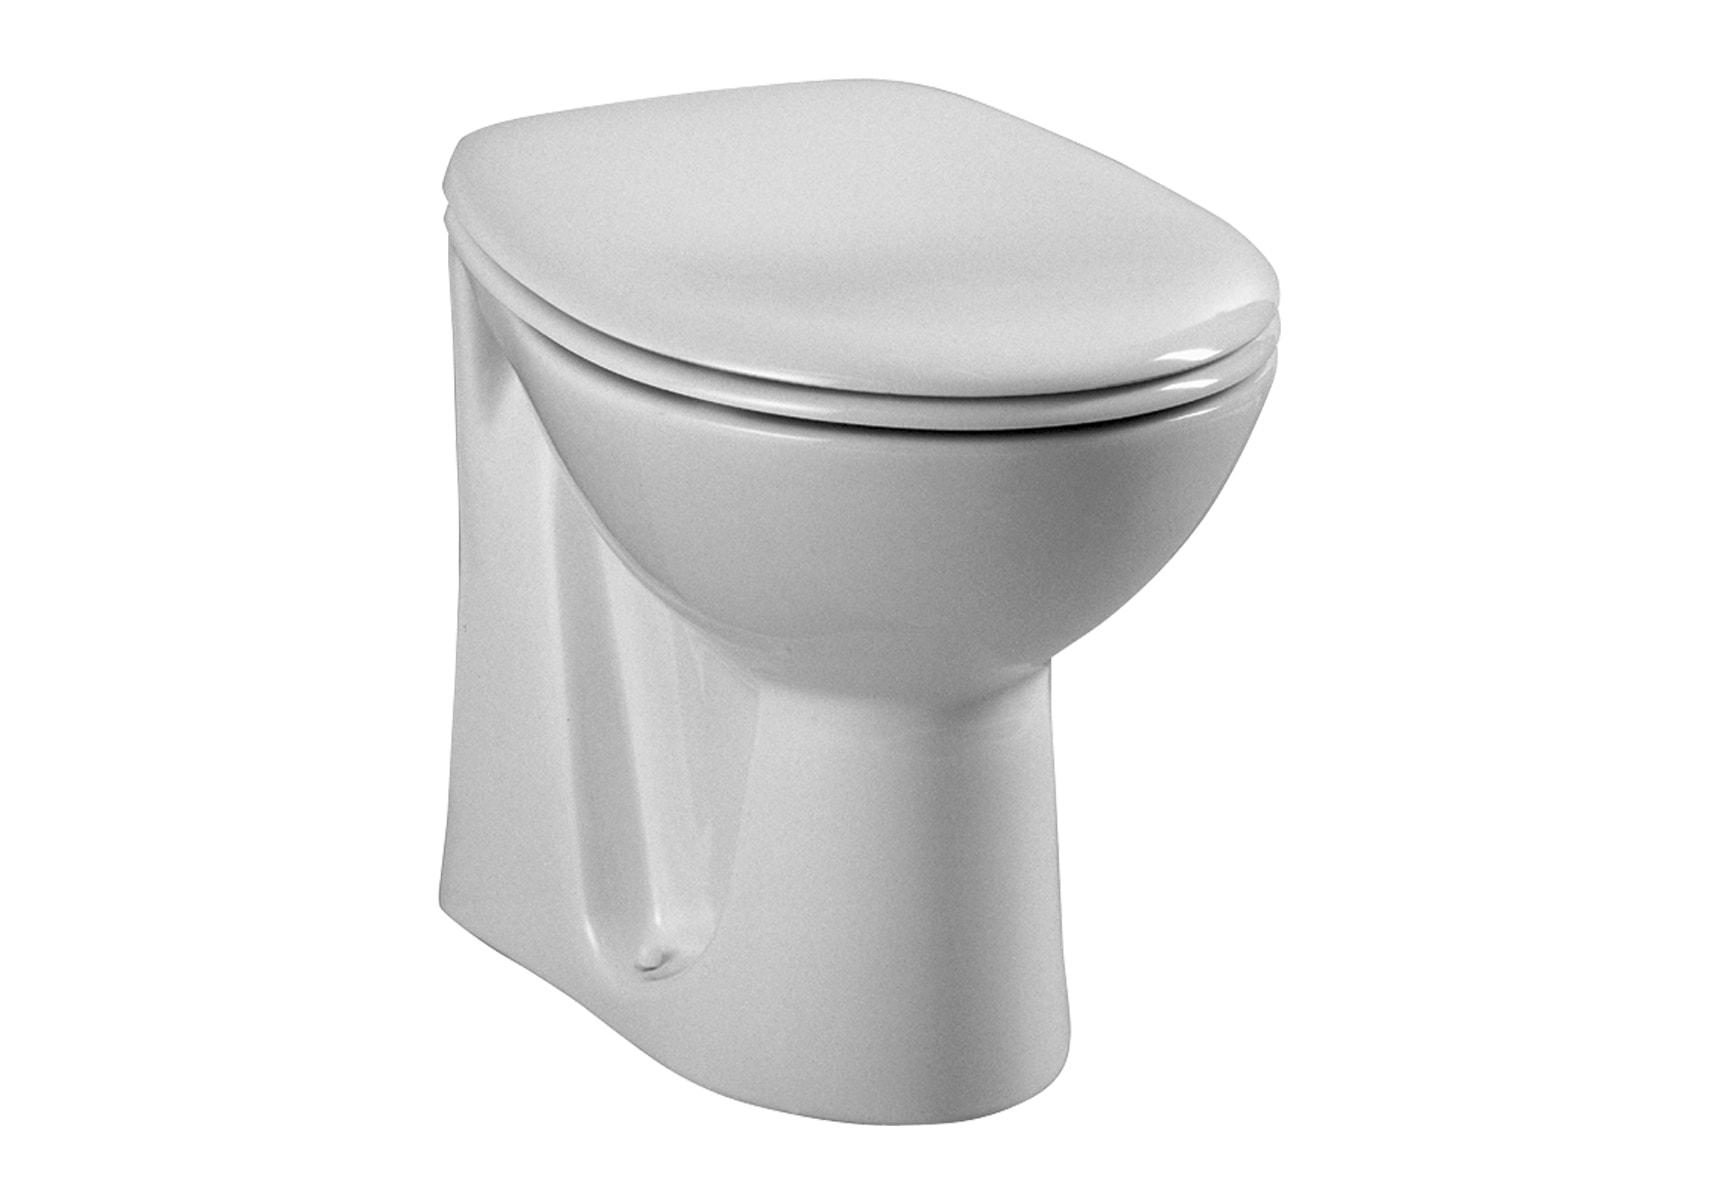 Arkitekt Single WC Pan, Back Outlet